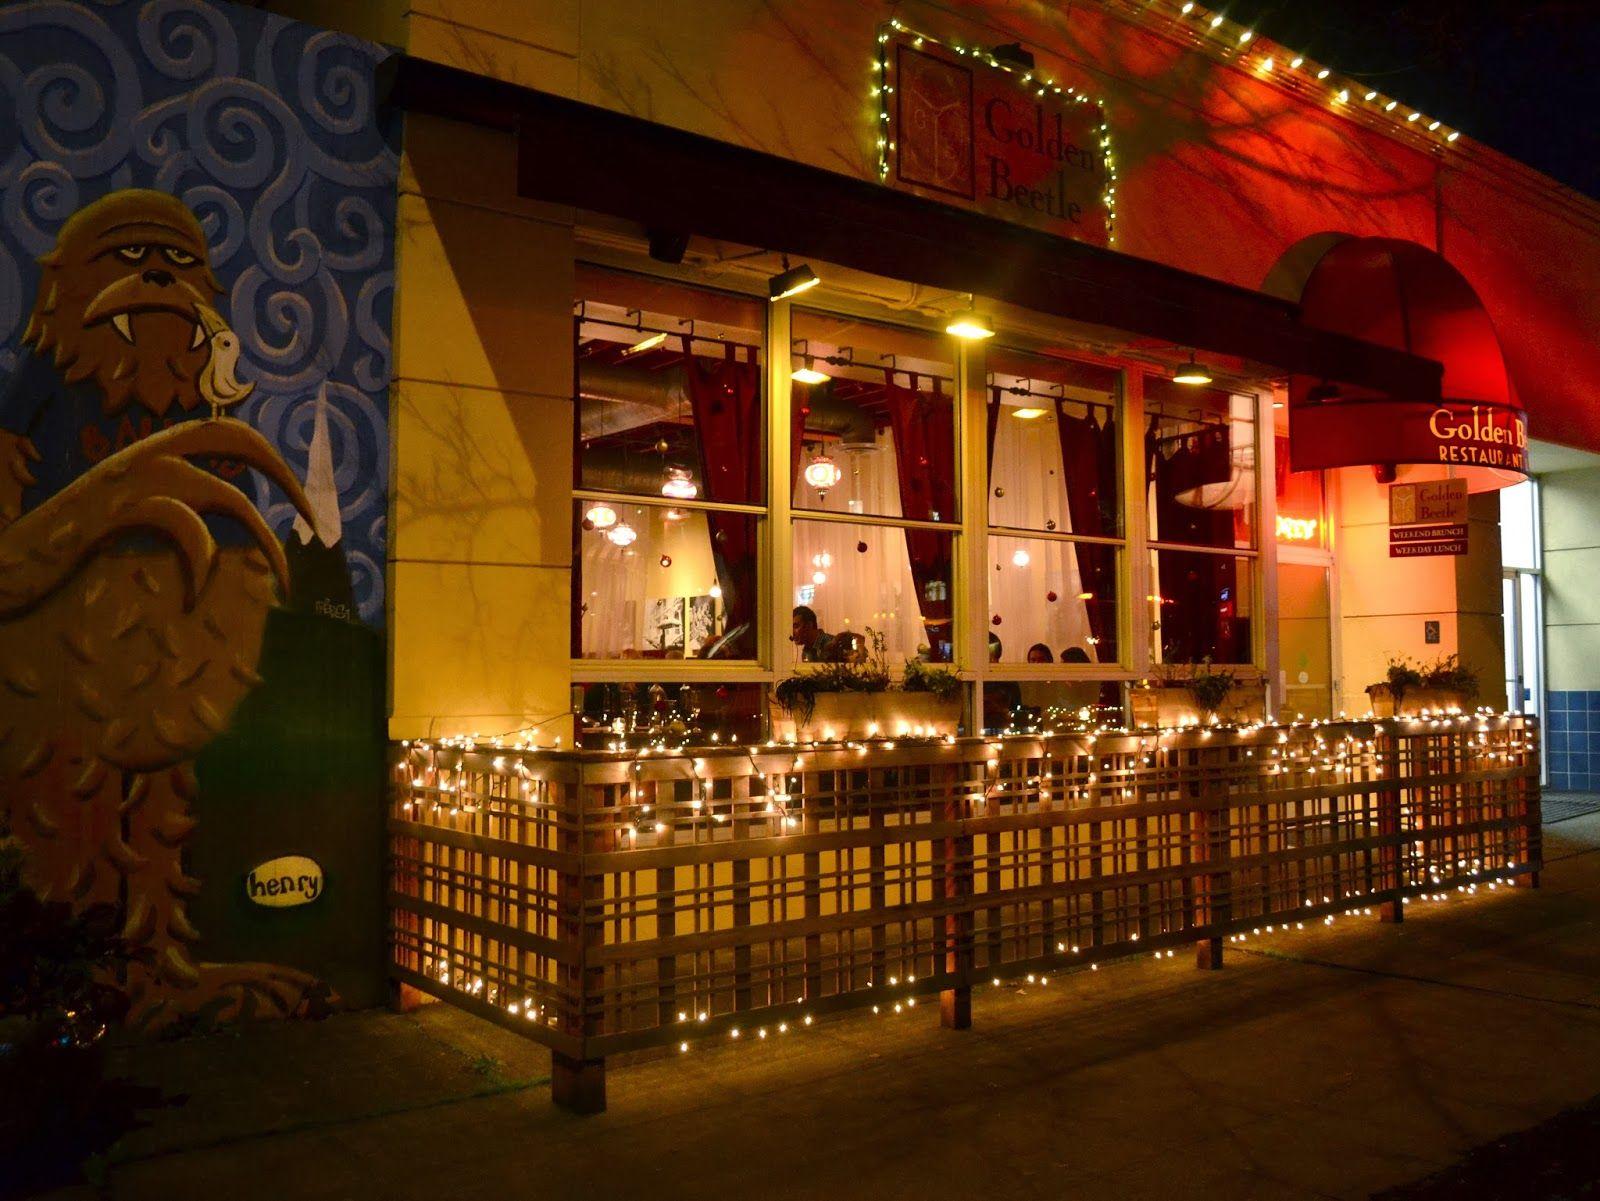 Golden Beetle Restaurant In Ballard Seattle Washington Food Restaurants